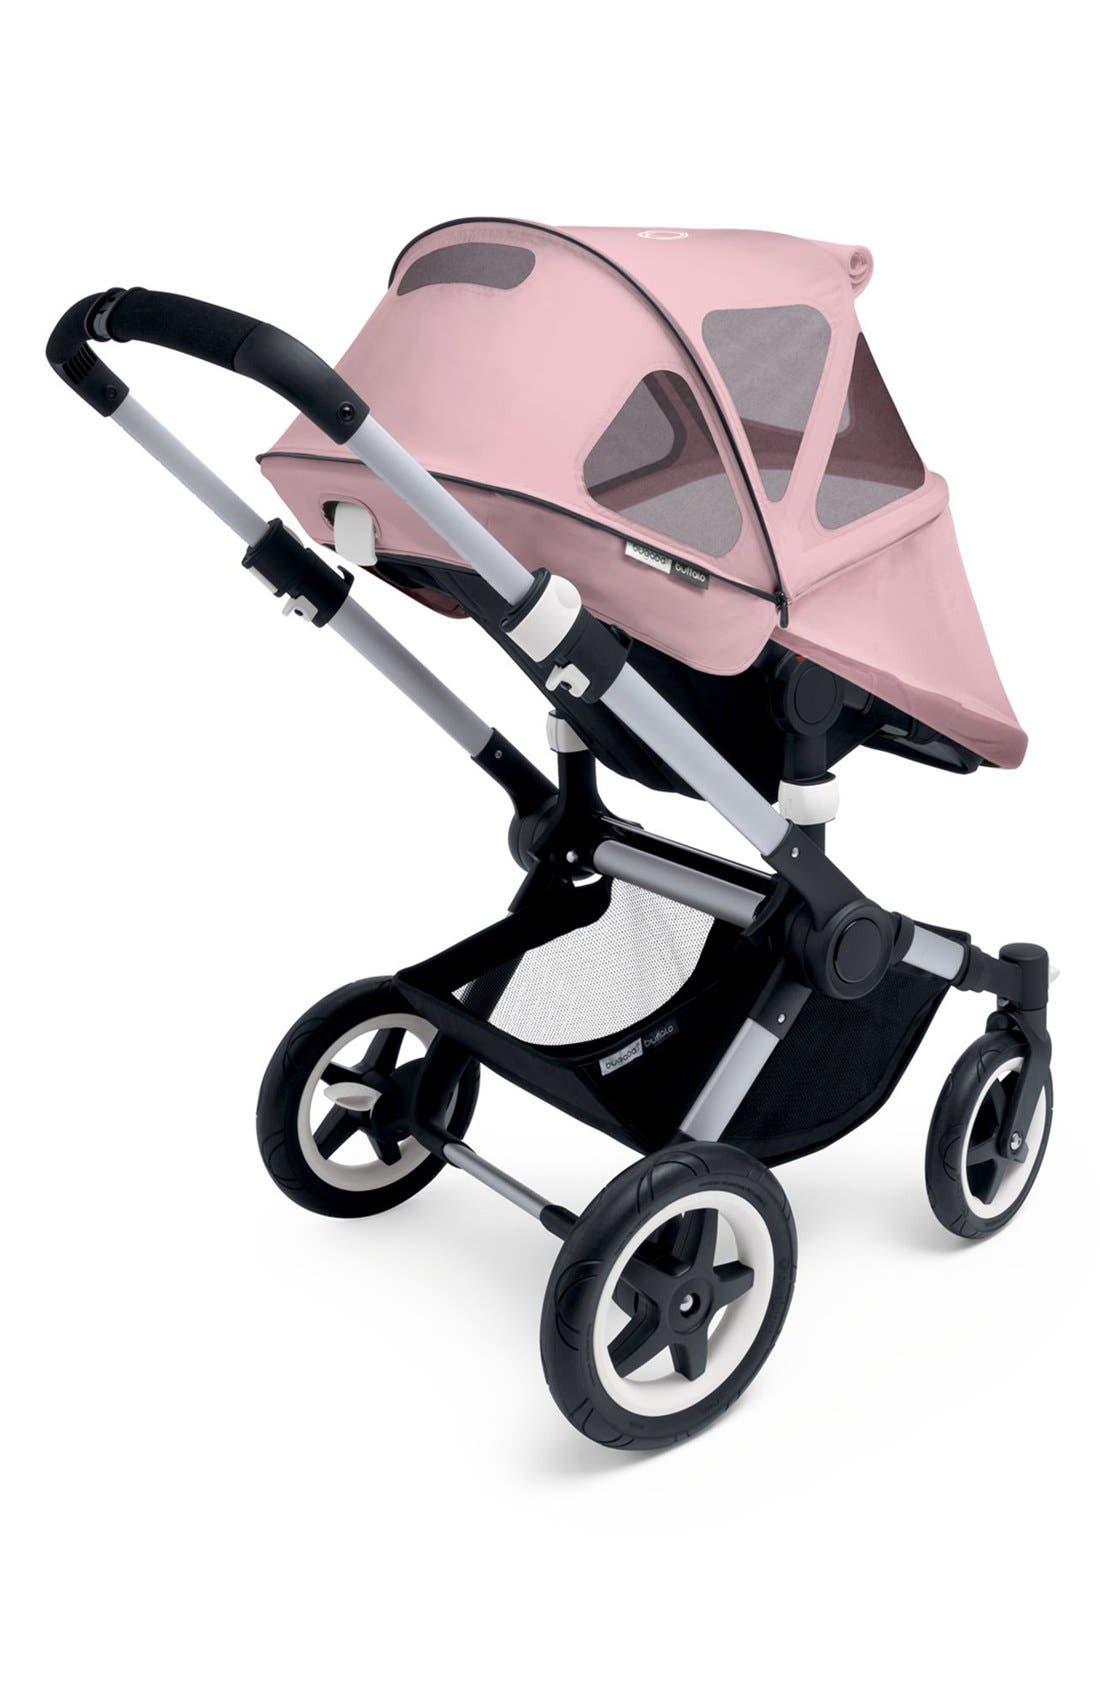 Bugaboo u0027Buffalo - Breezyu0027 Sun Canopy  sc 1 st  Nordstrom & Pink Bugaboo Strollers u0026 Stroller Accessories | Nordstrom